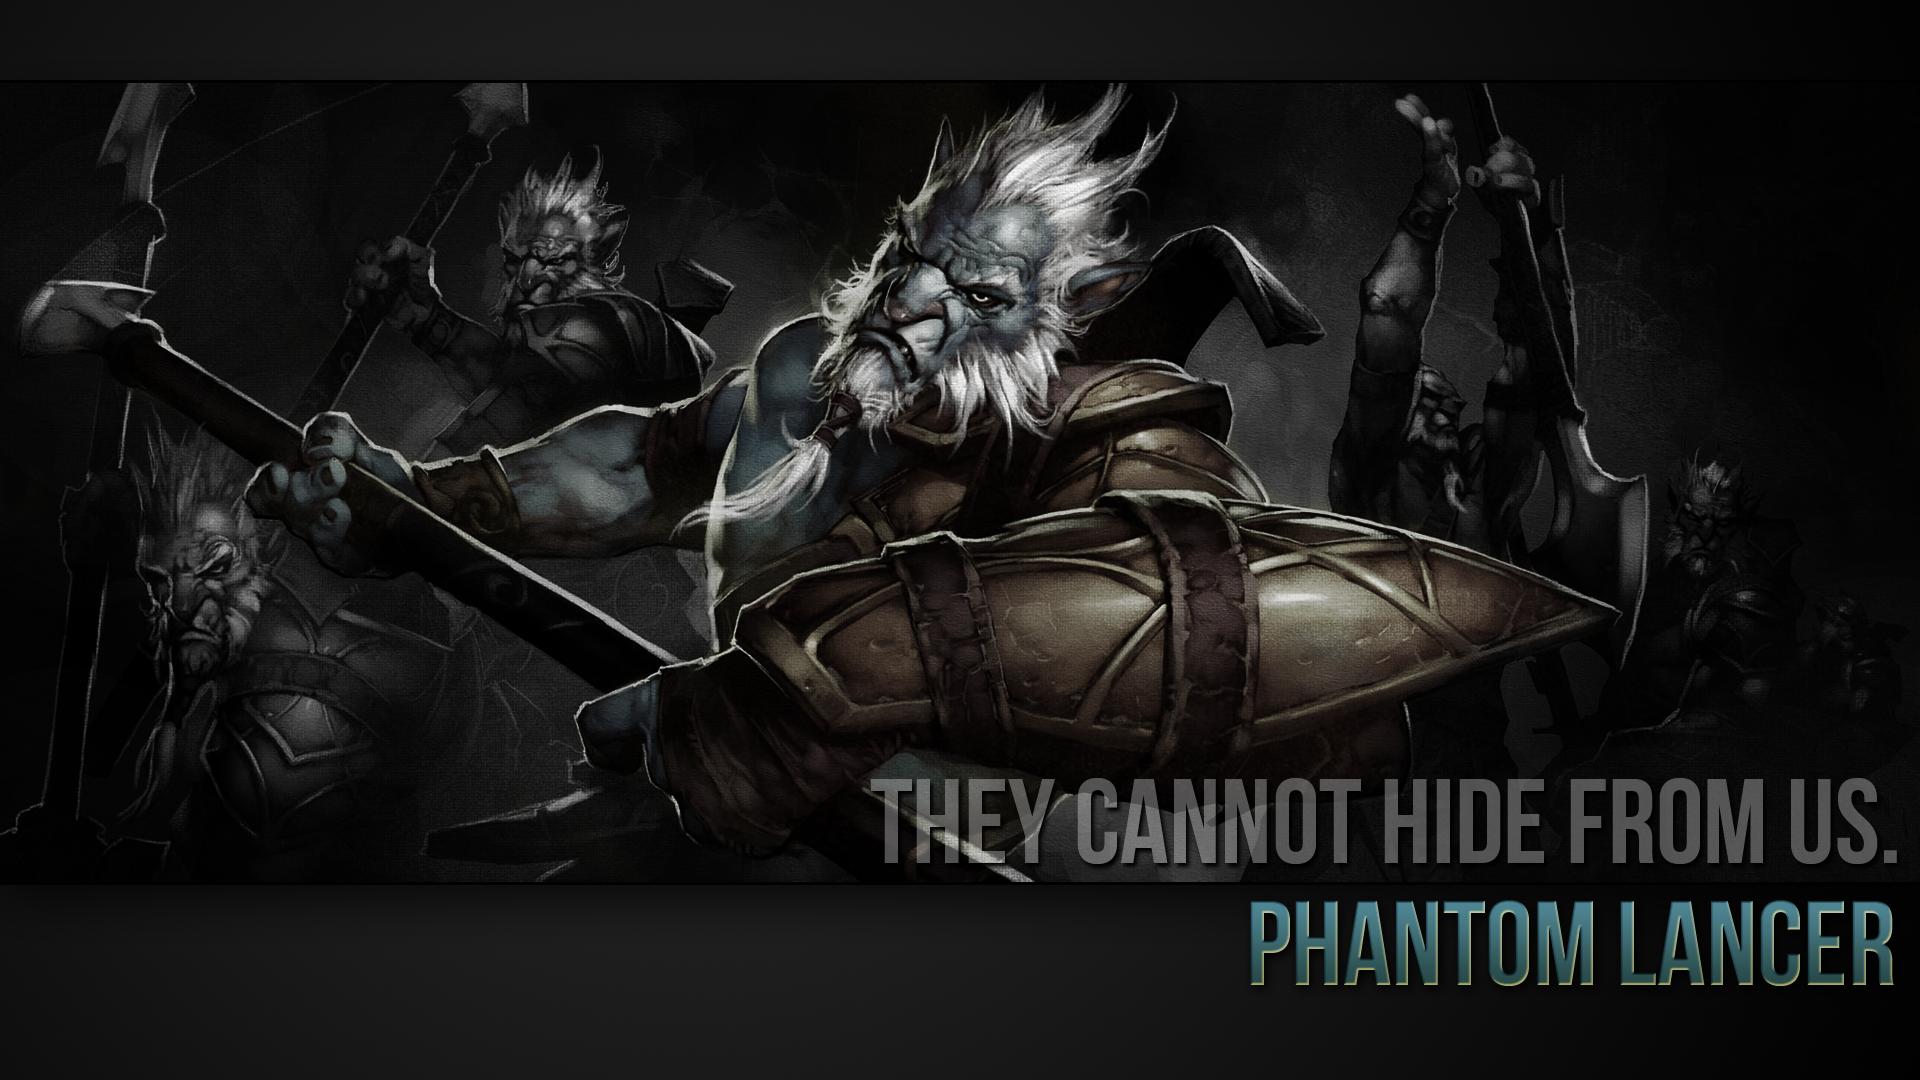 Phantom Lancer Wallpaper By ImKB